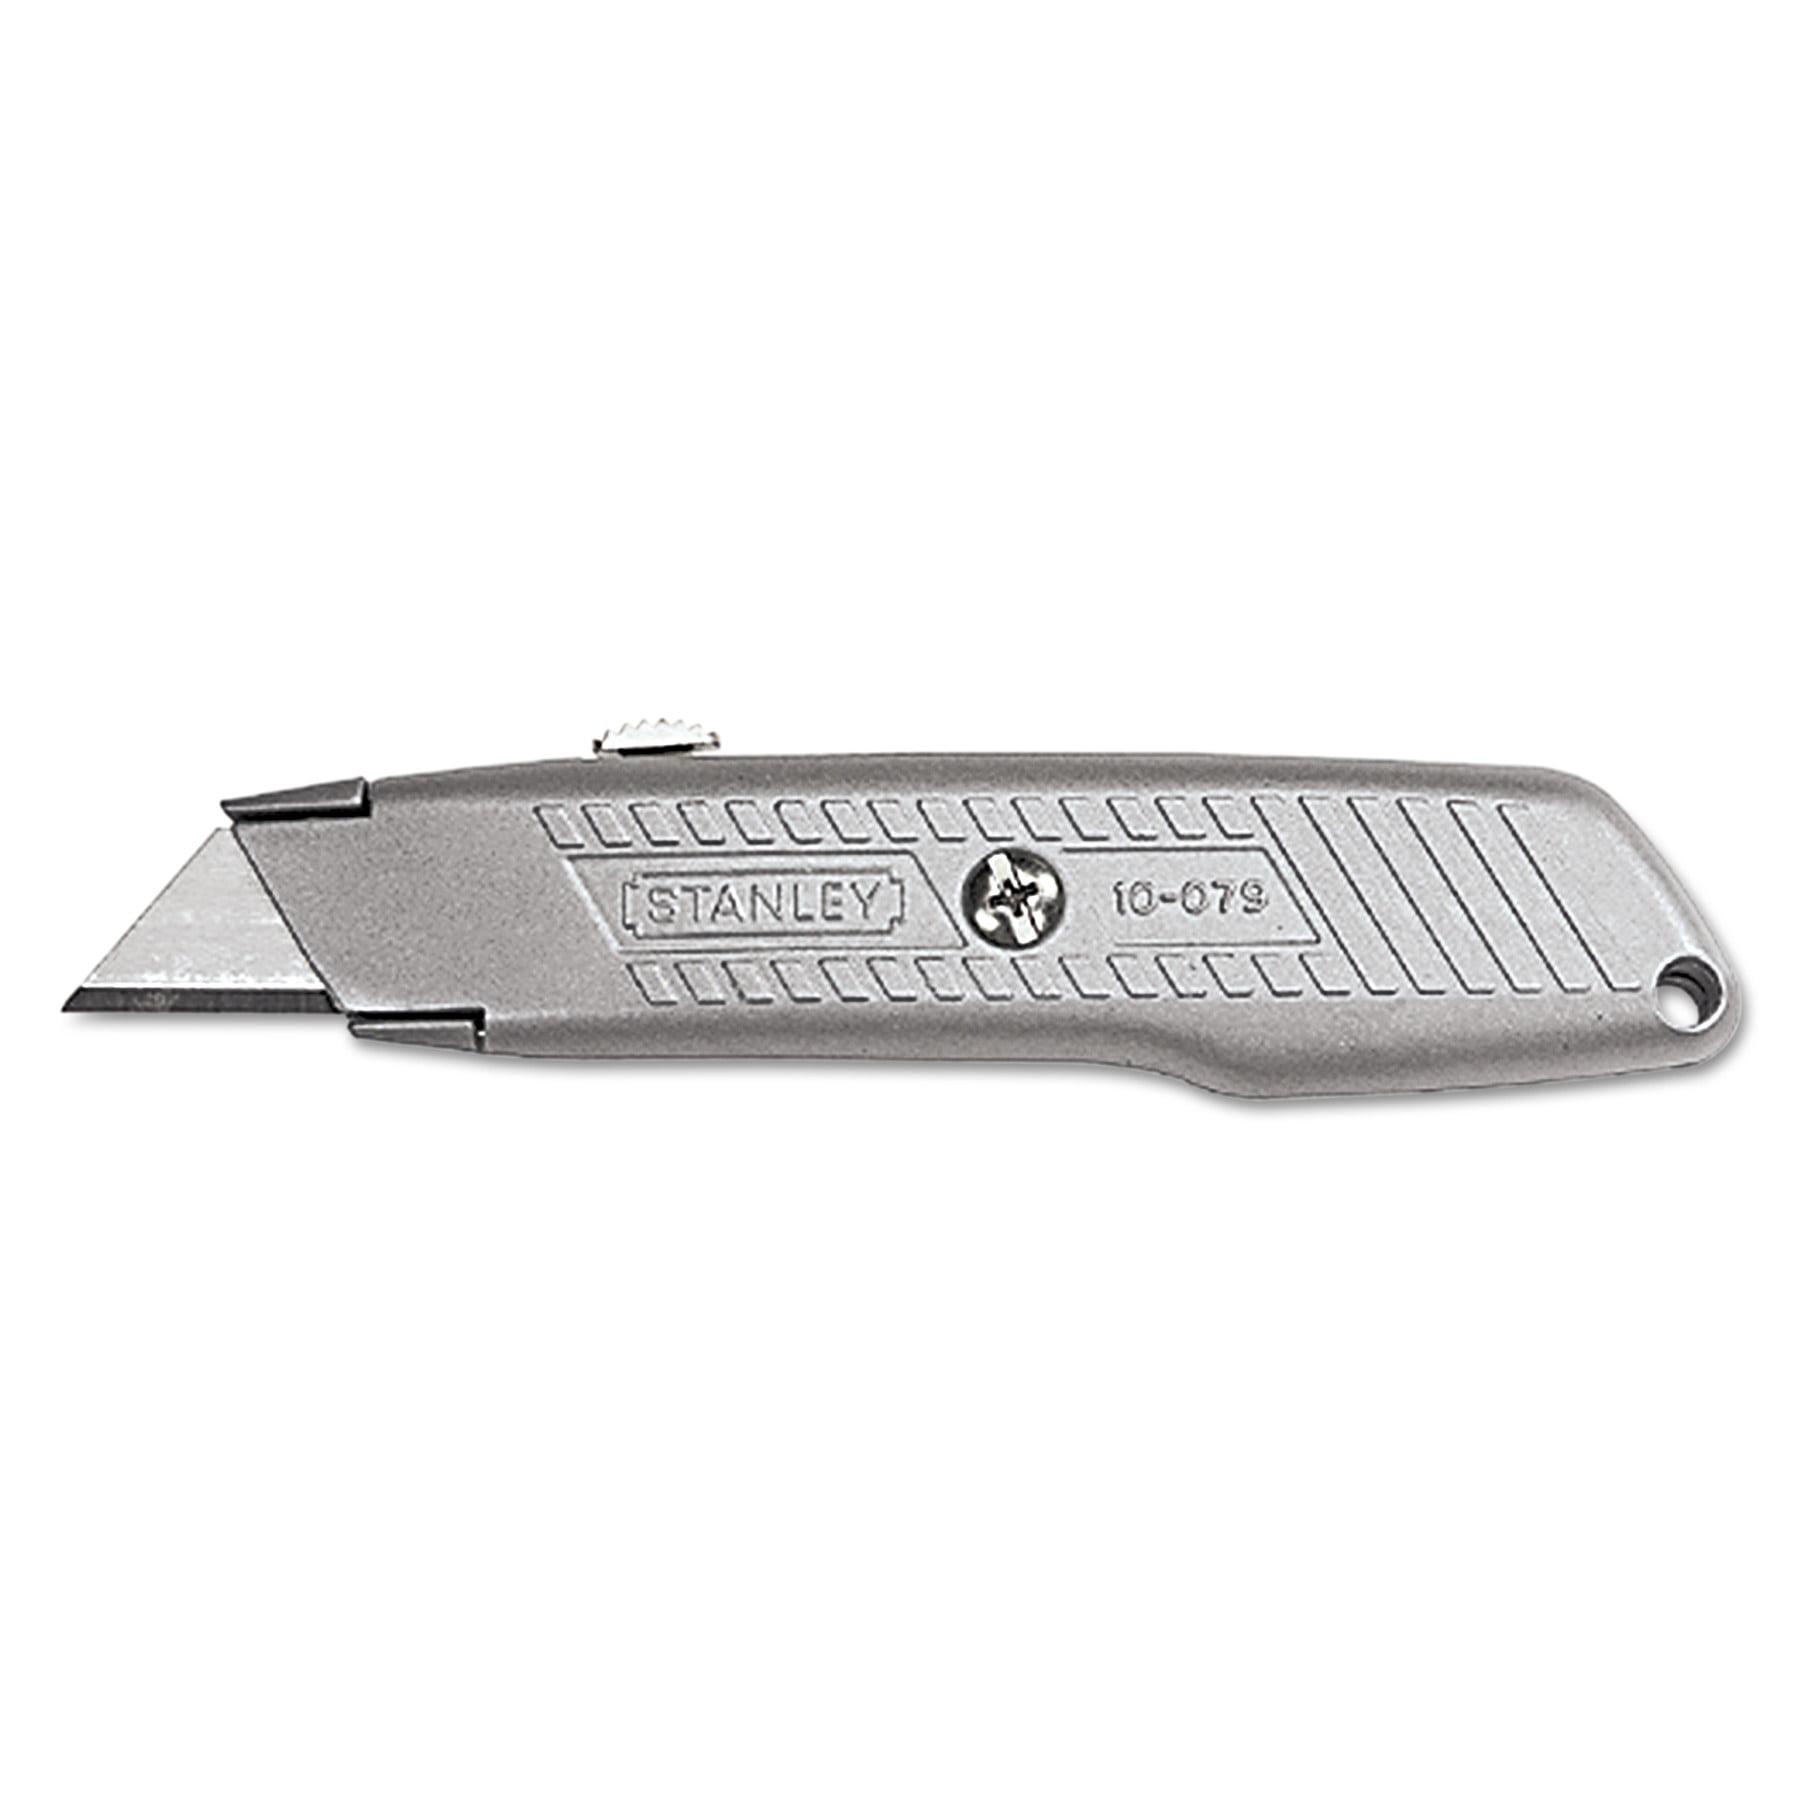 Stanley Tools Interlock Retractable Utility Knife, Metal